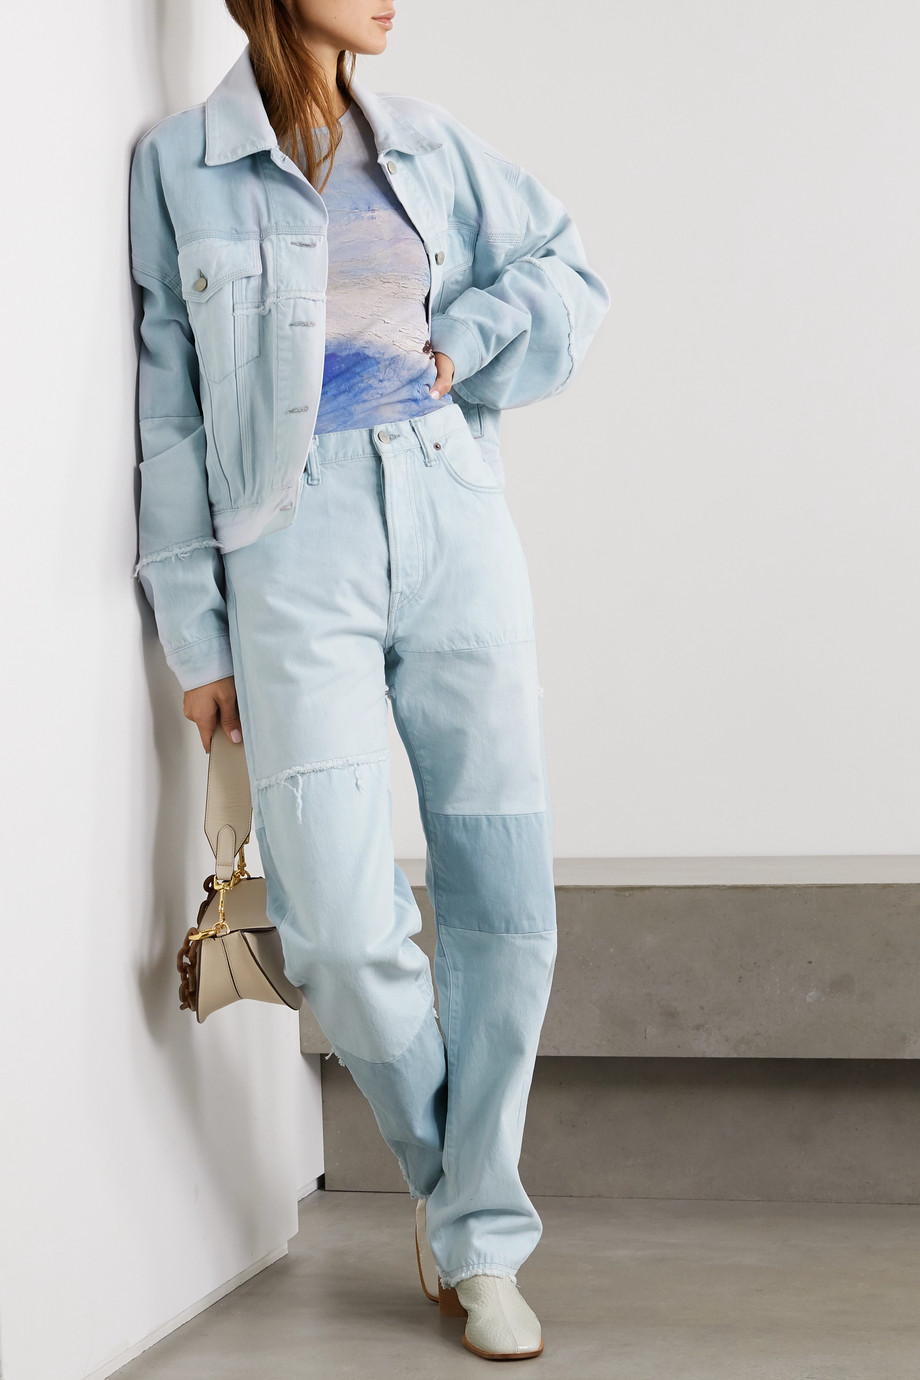 Acne Studios 【NET SUSTAIN】1996 毛边拼布有机高腰直筒牛仔裤